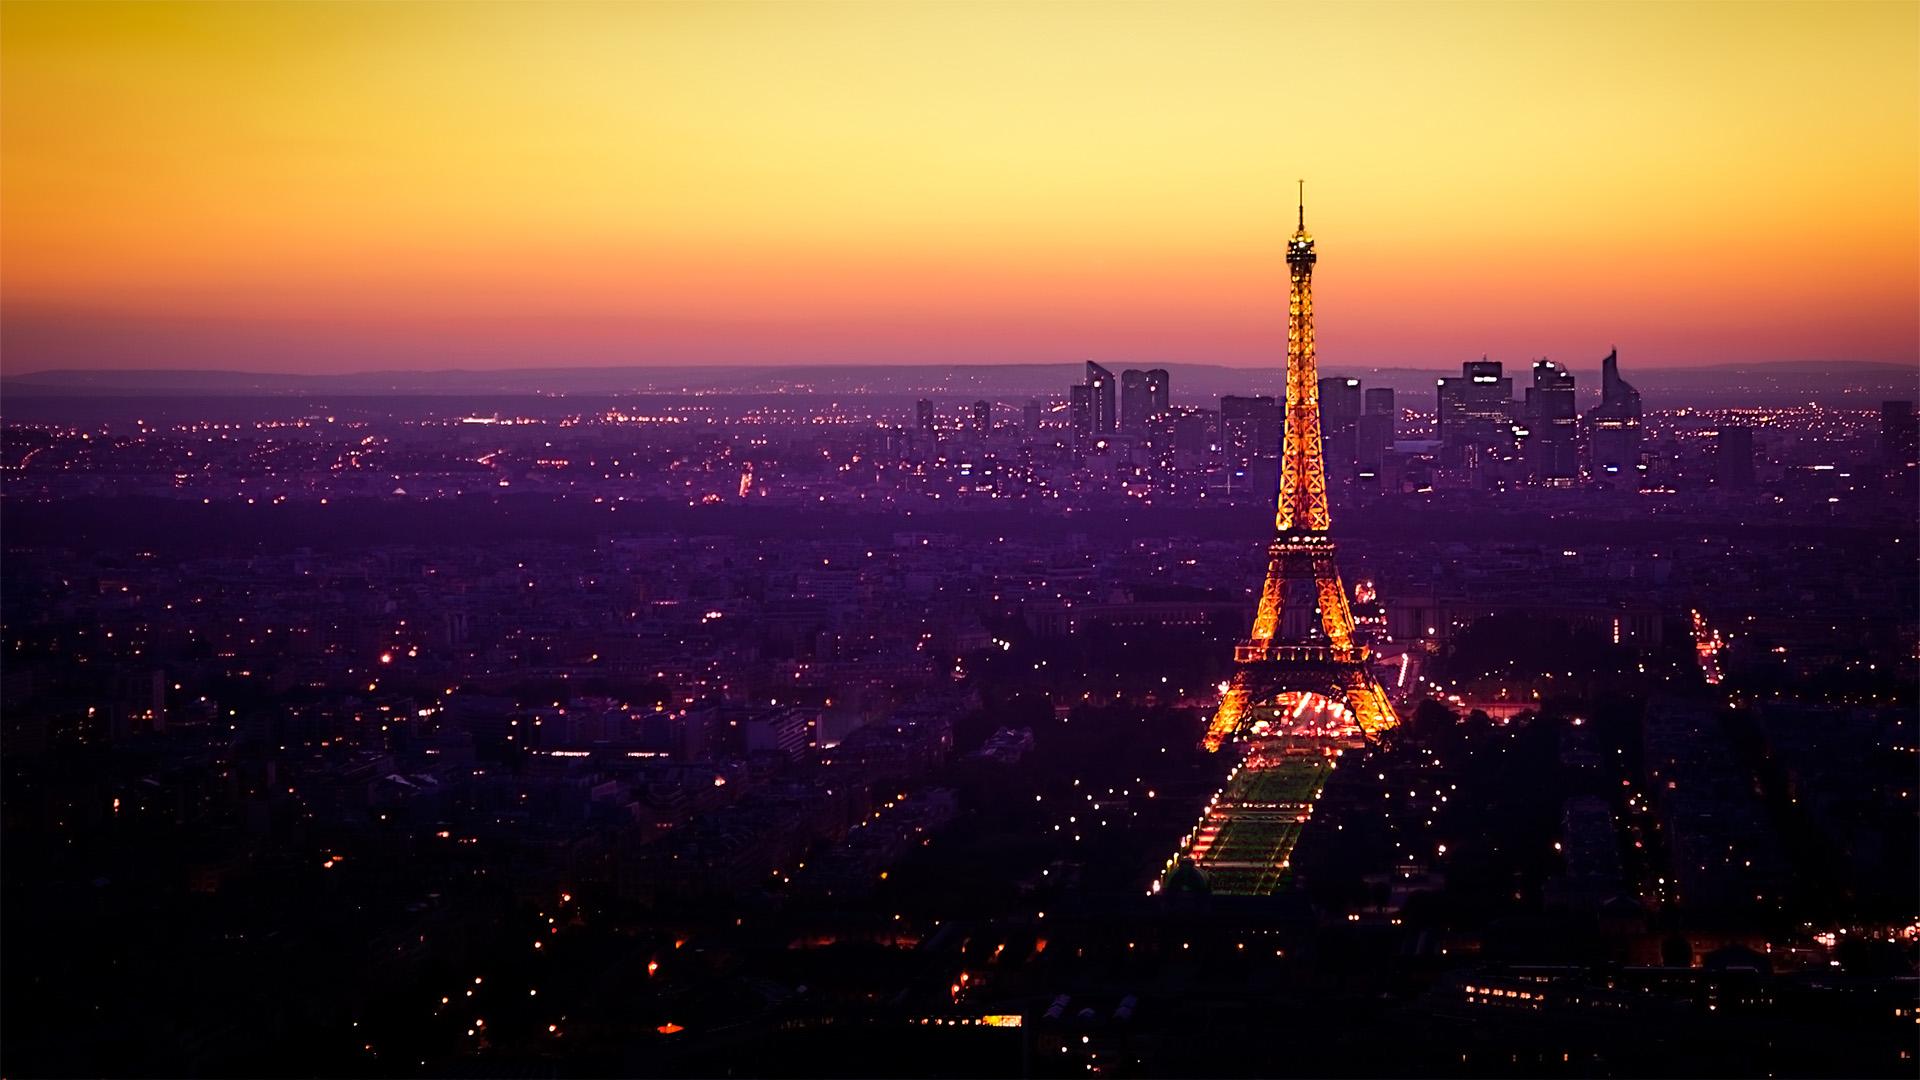 Night Fall In Paris Wallpaper 1920x1080